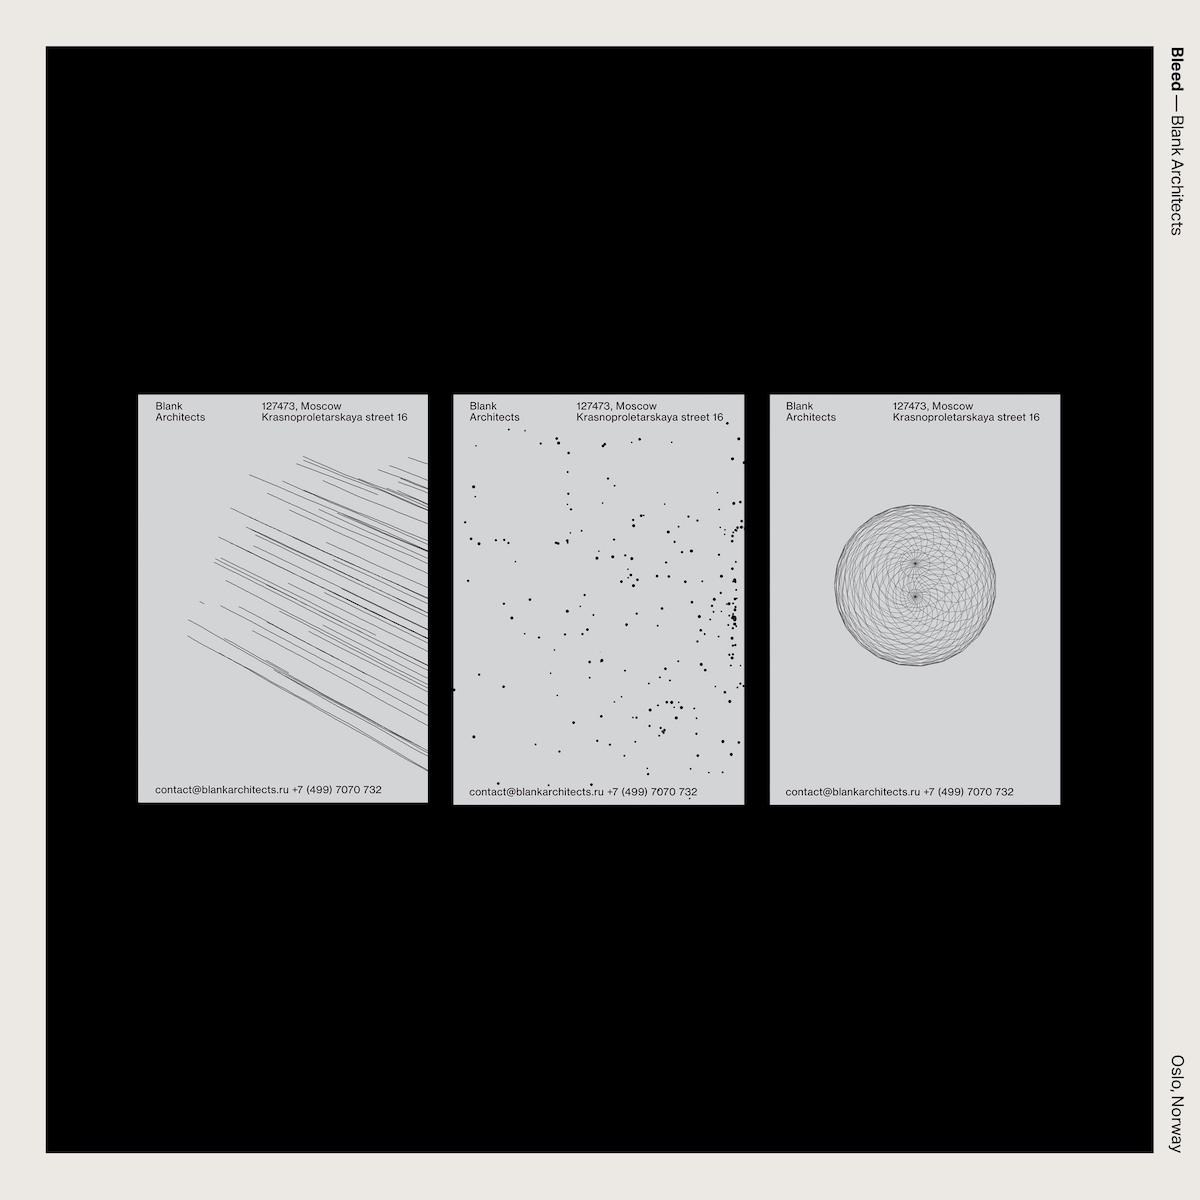 Bleed — Blank Architects